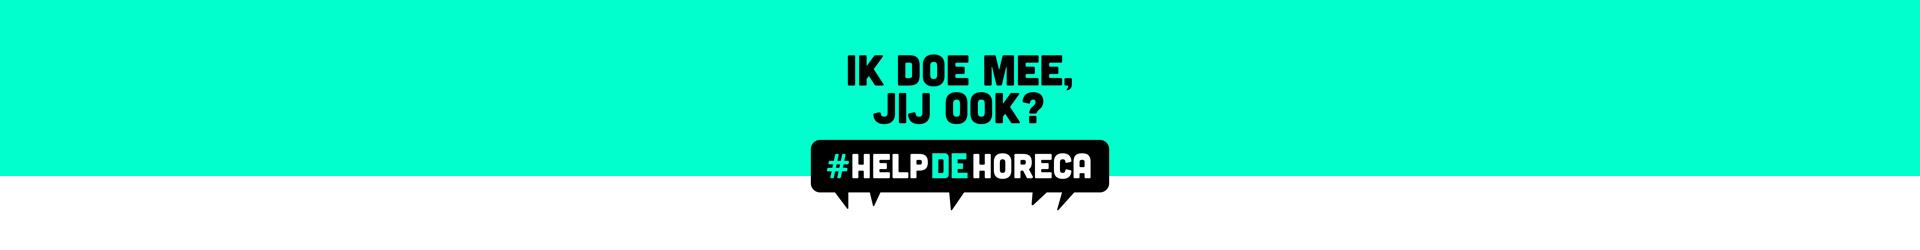 Hero #helpdehoreca 1920x250.jpg